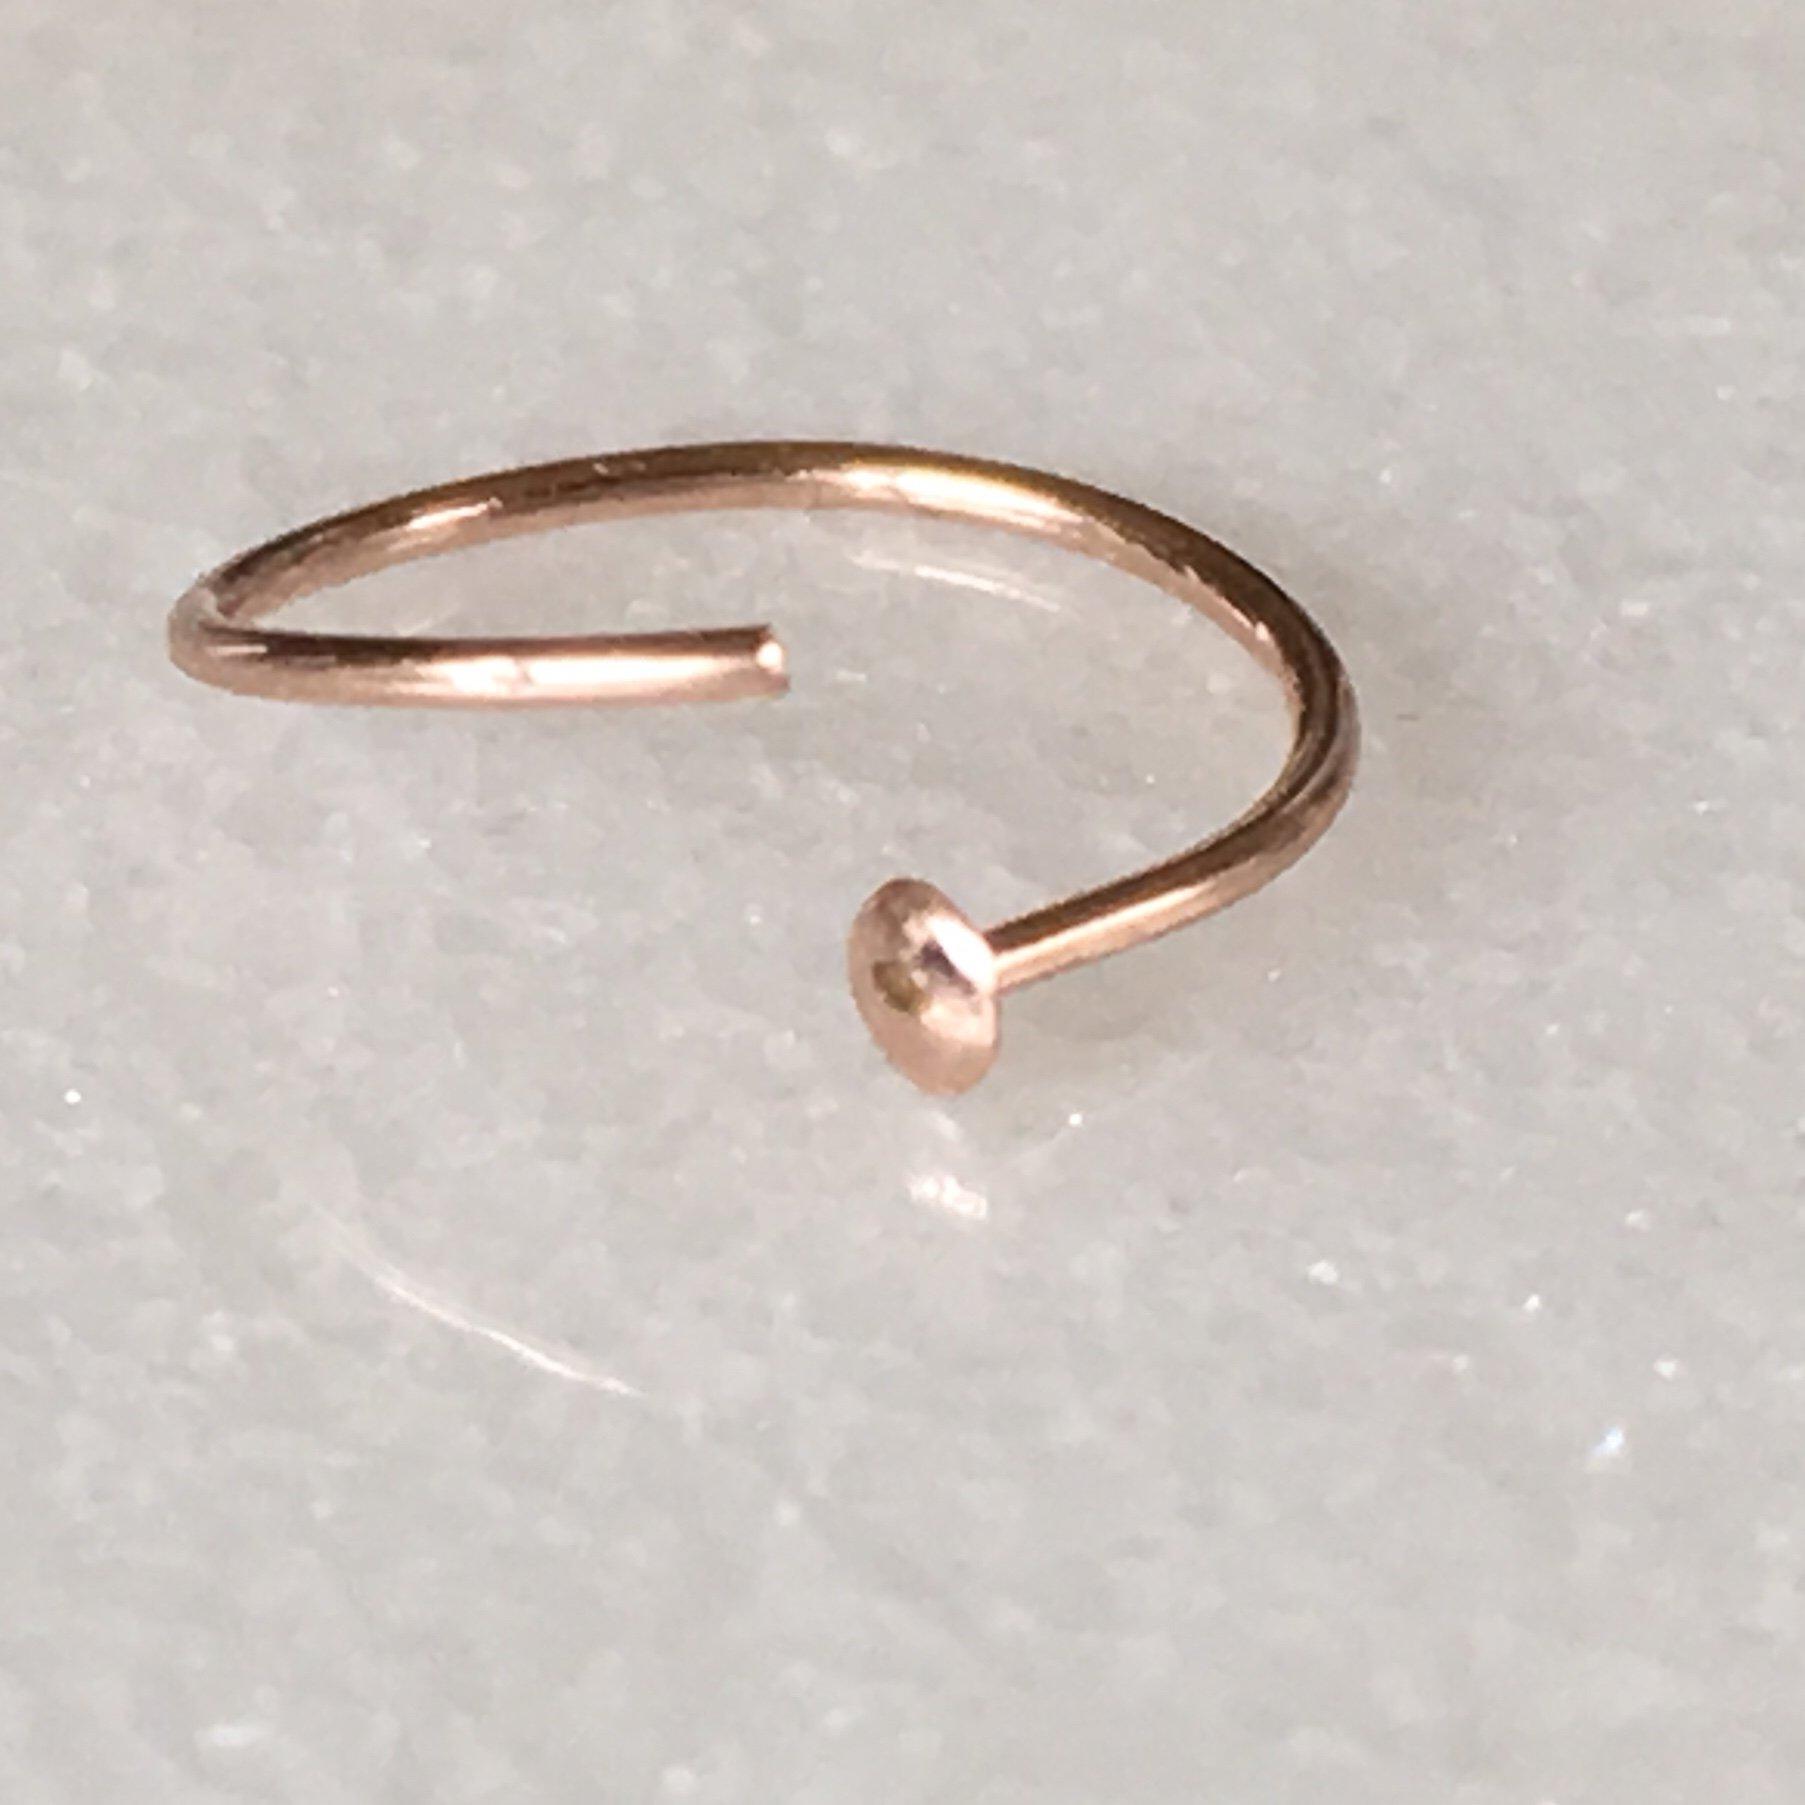 Rose Gold Hoop Nose Ring - 24g 6-7MM Inner Diameter Slightly Adjustable by EllieJMaui